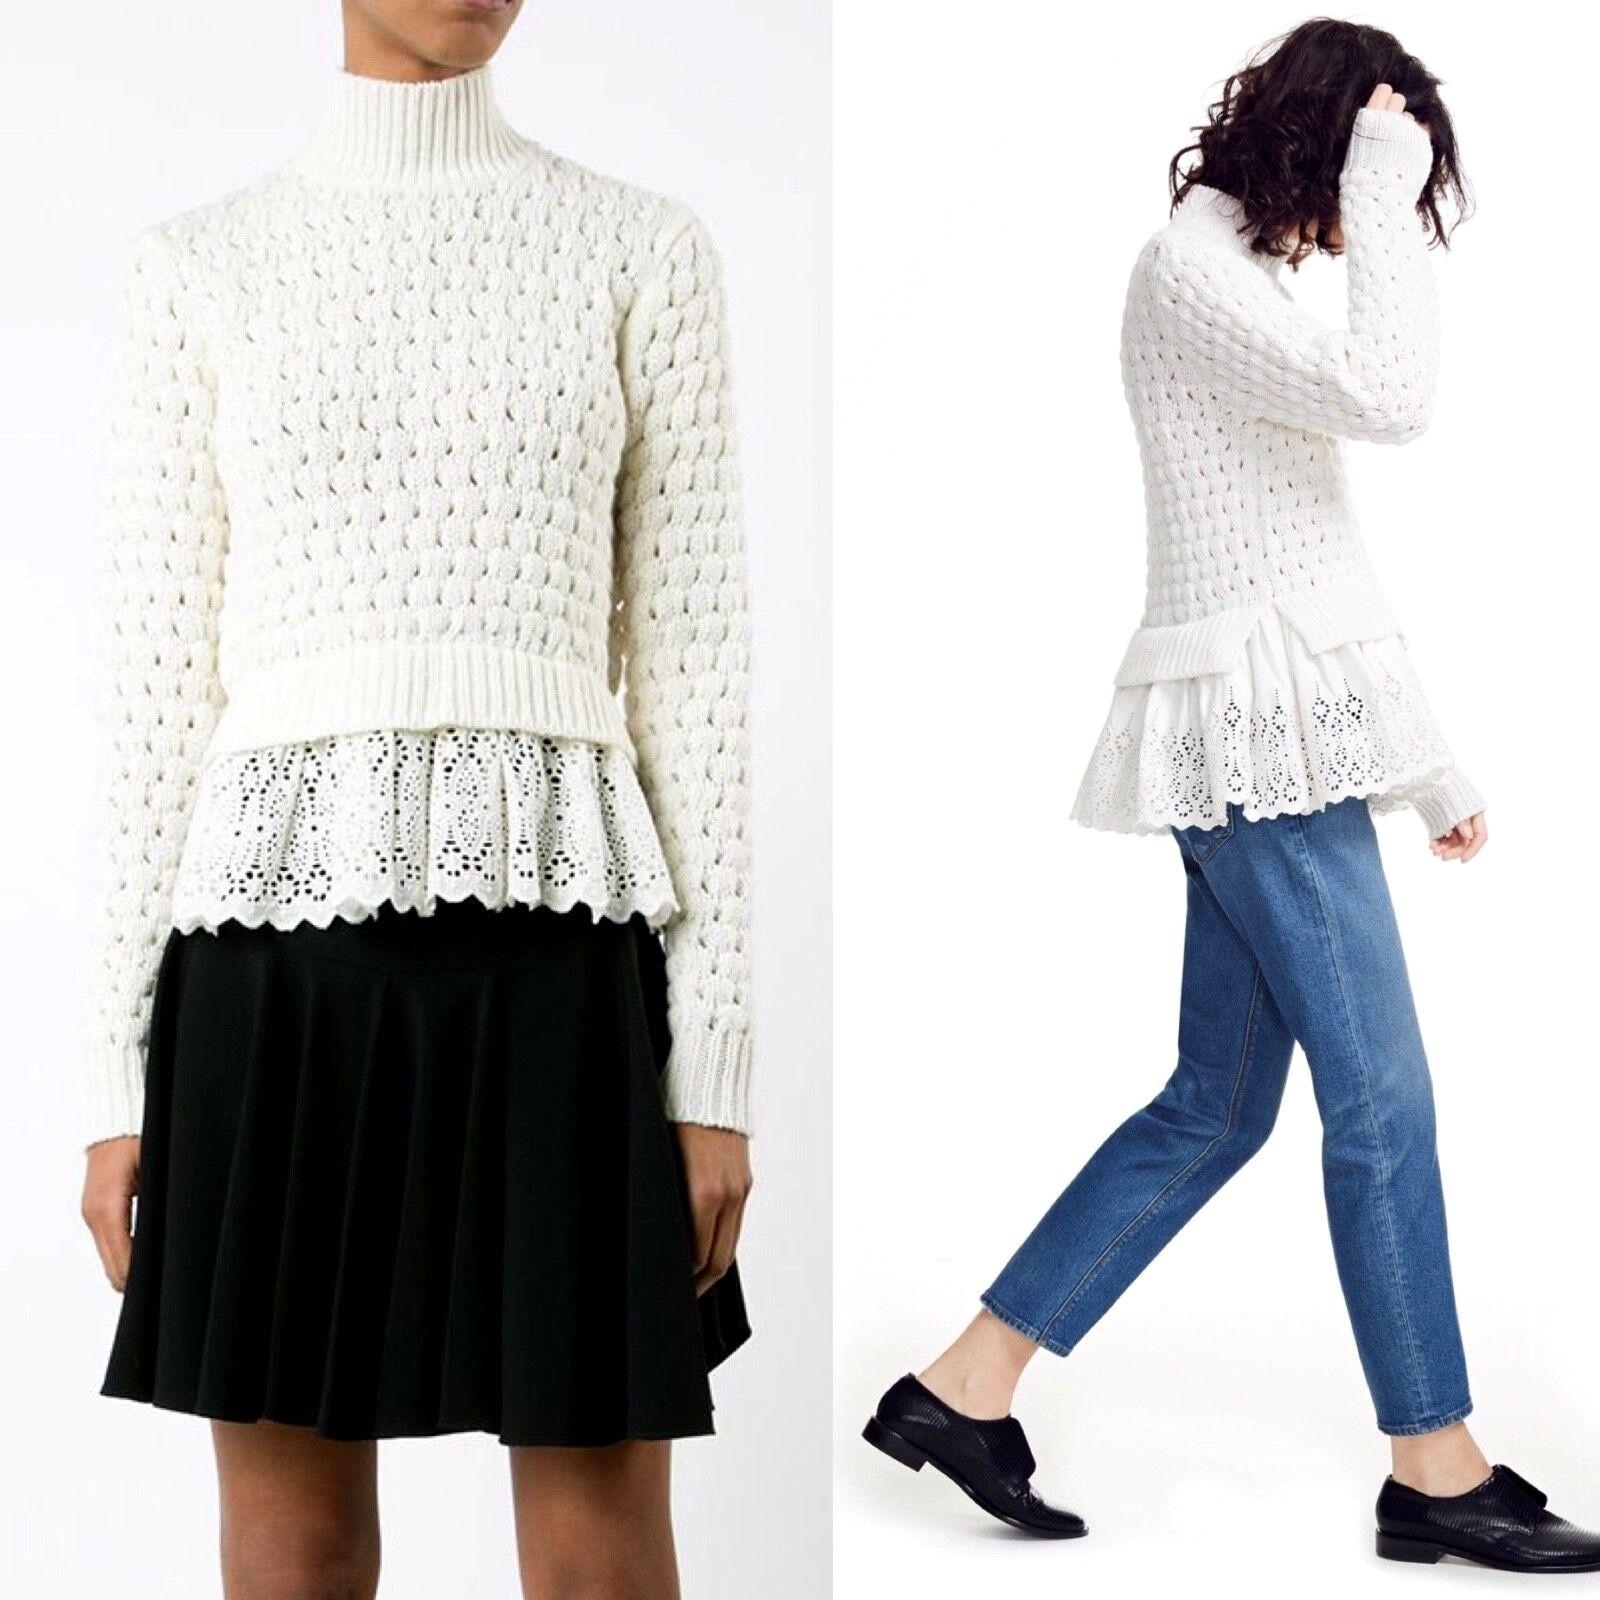 Rebecca Taylor Popcorn Knit Knit Knit Wool Blend Eyelet Sweater Medium Ivory Chalk M  395 9993ec